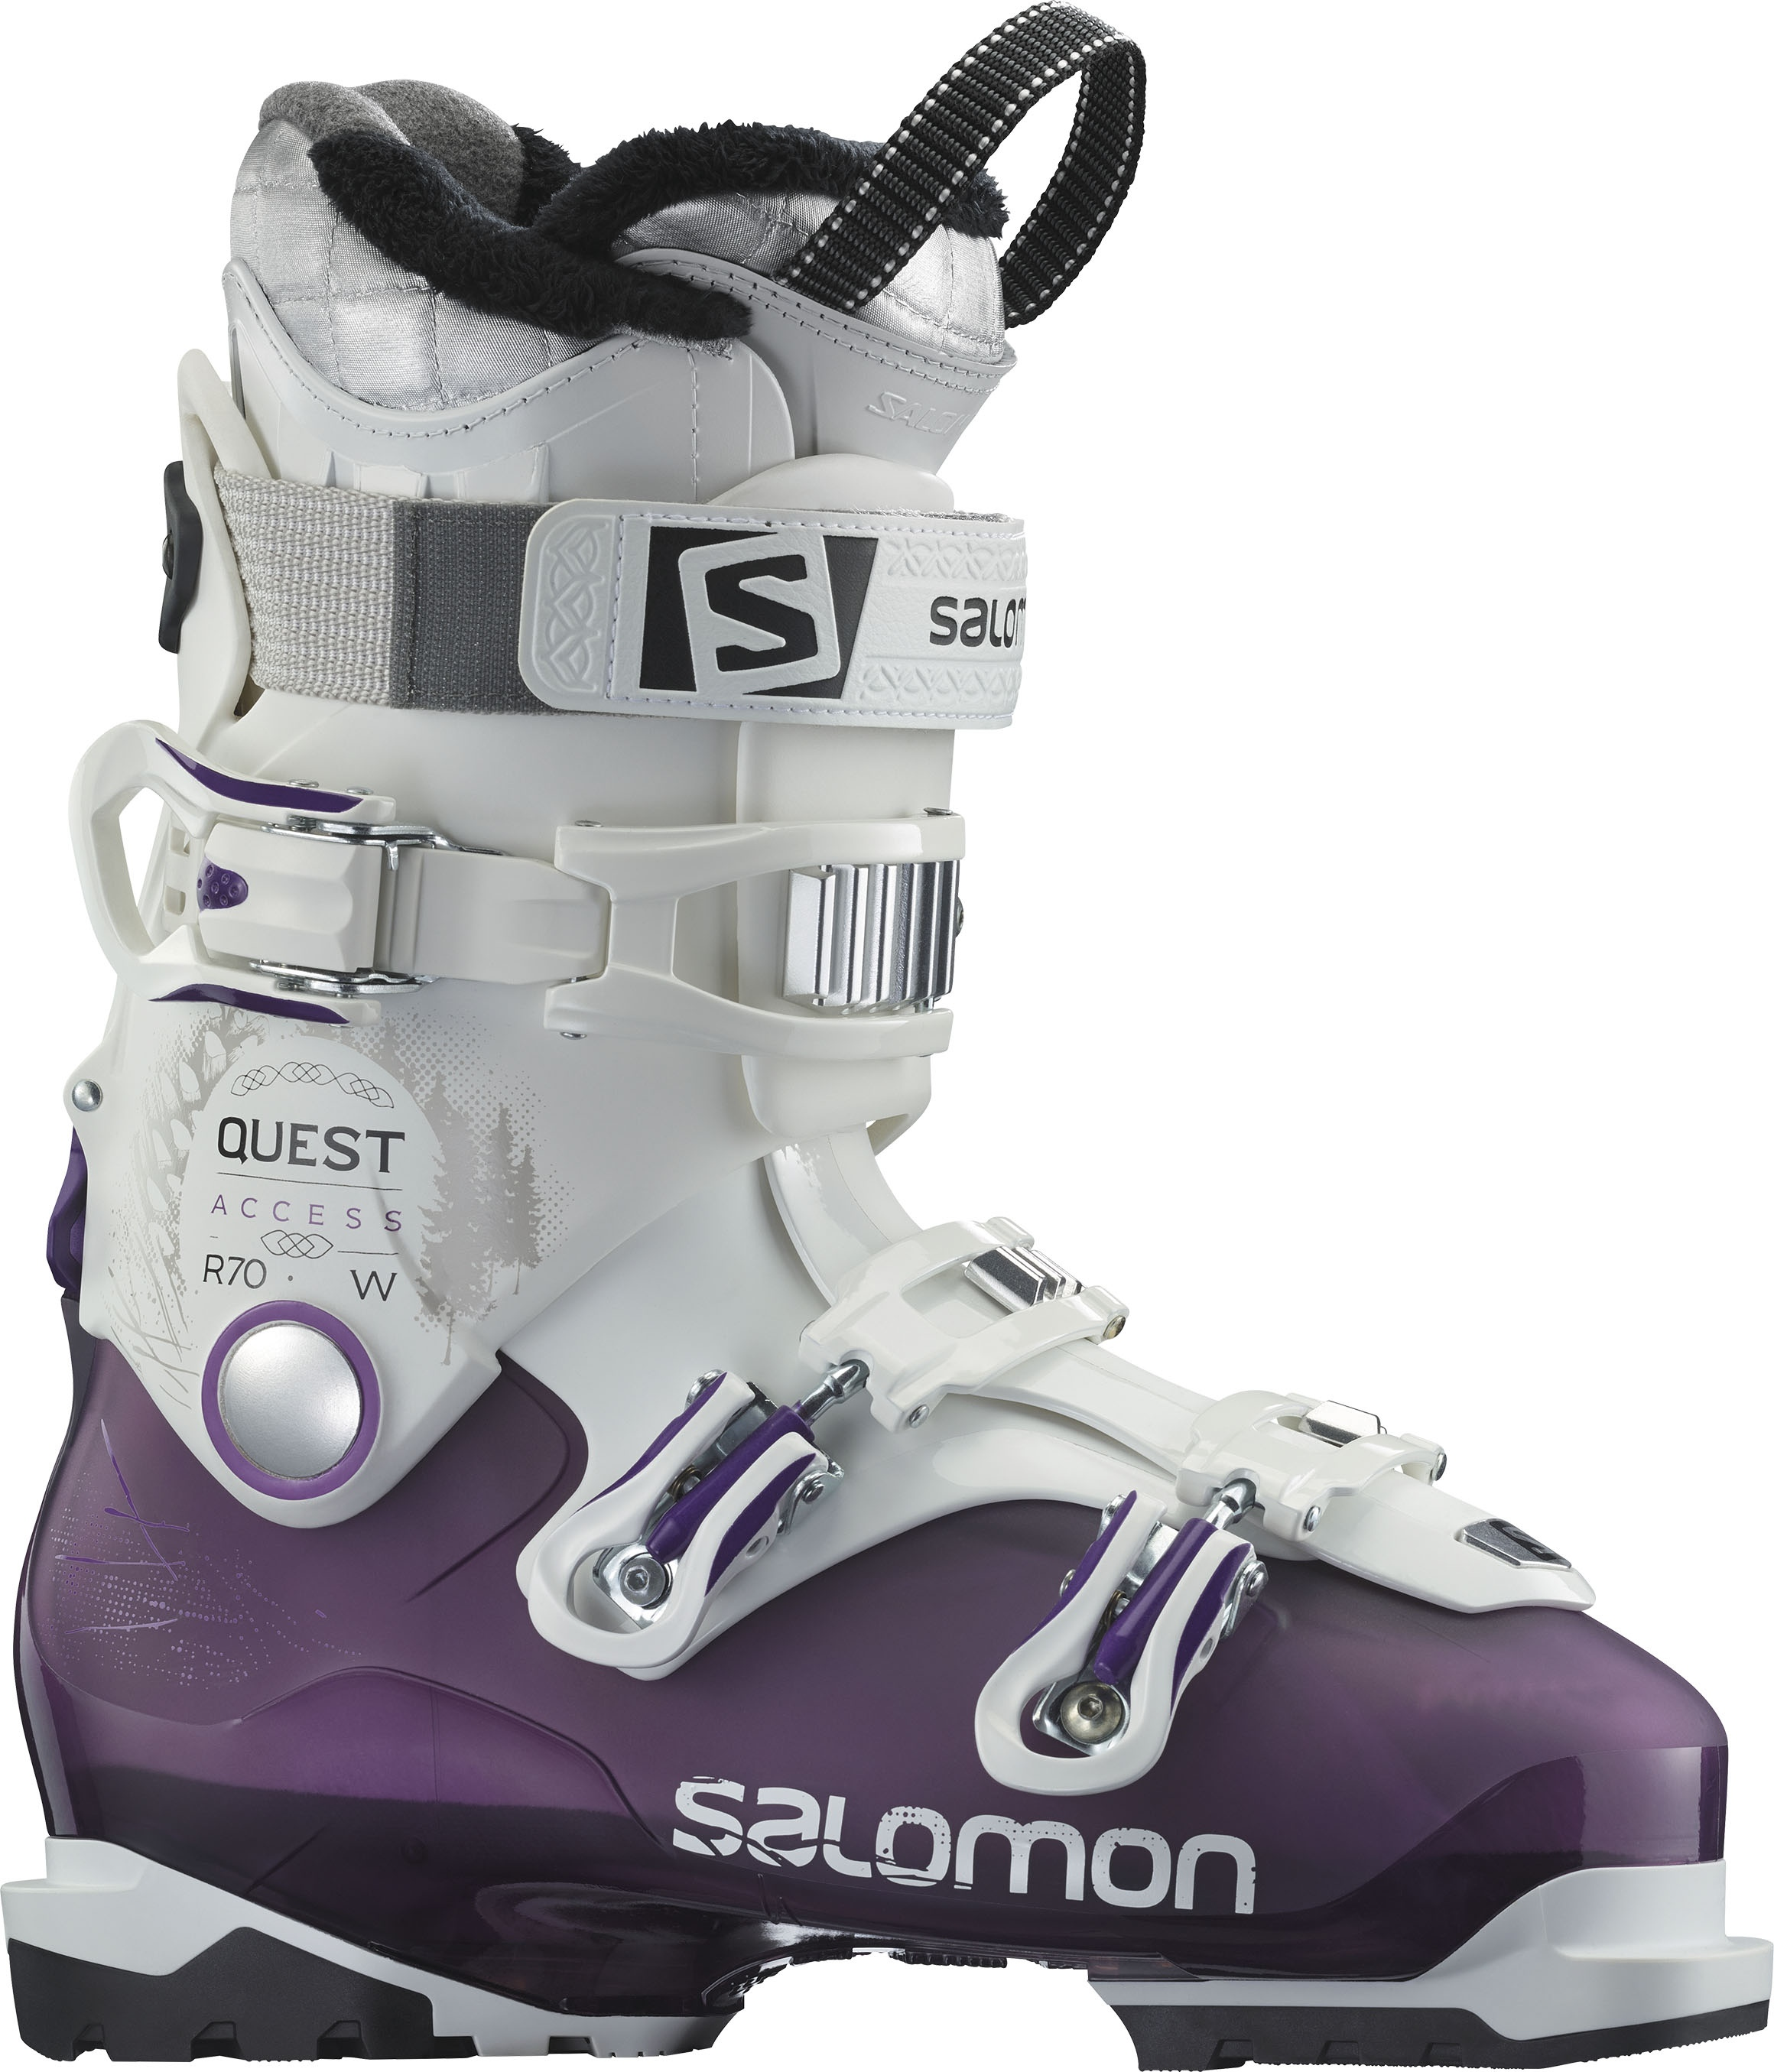 chaussures ski salomon quest 70,chaussures ski salomon quest